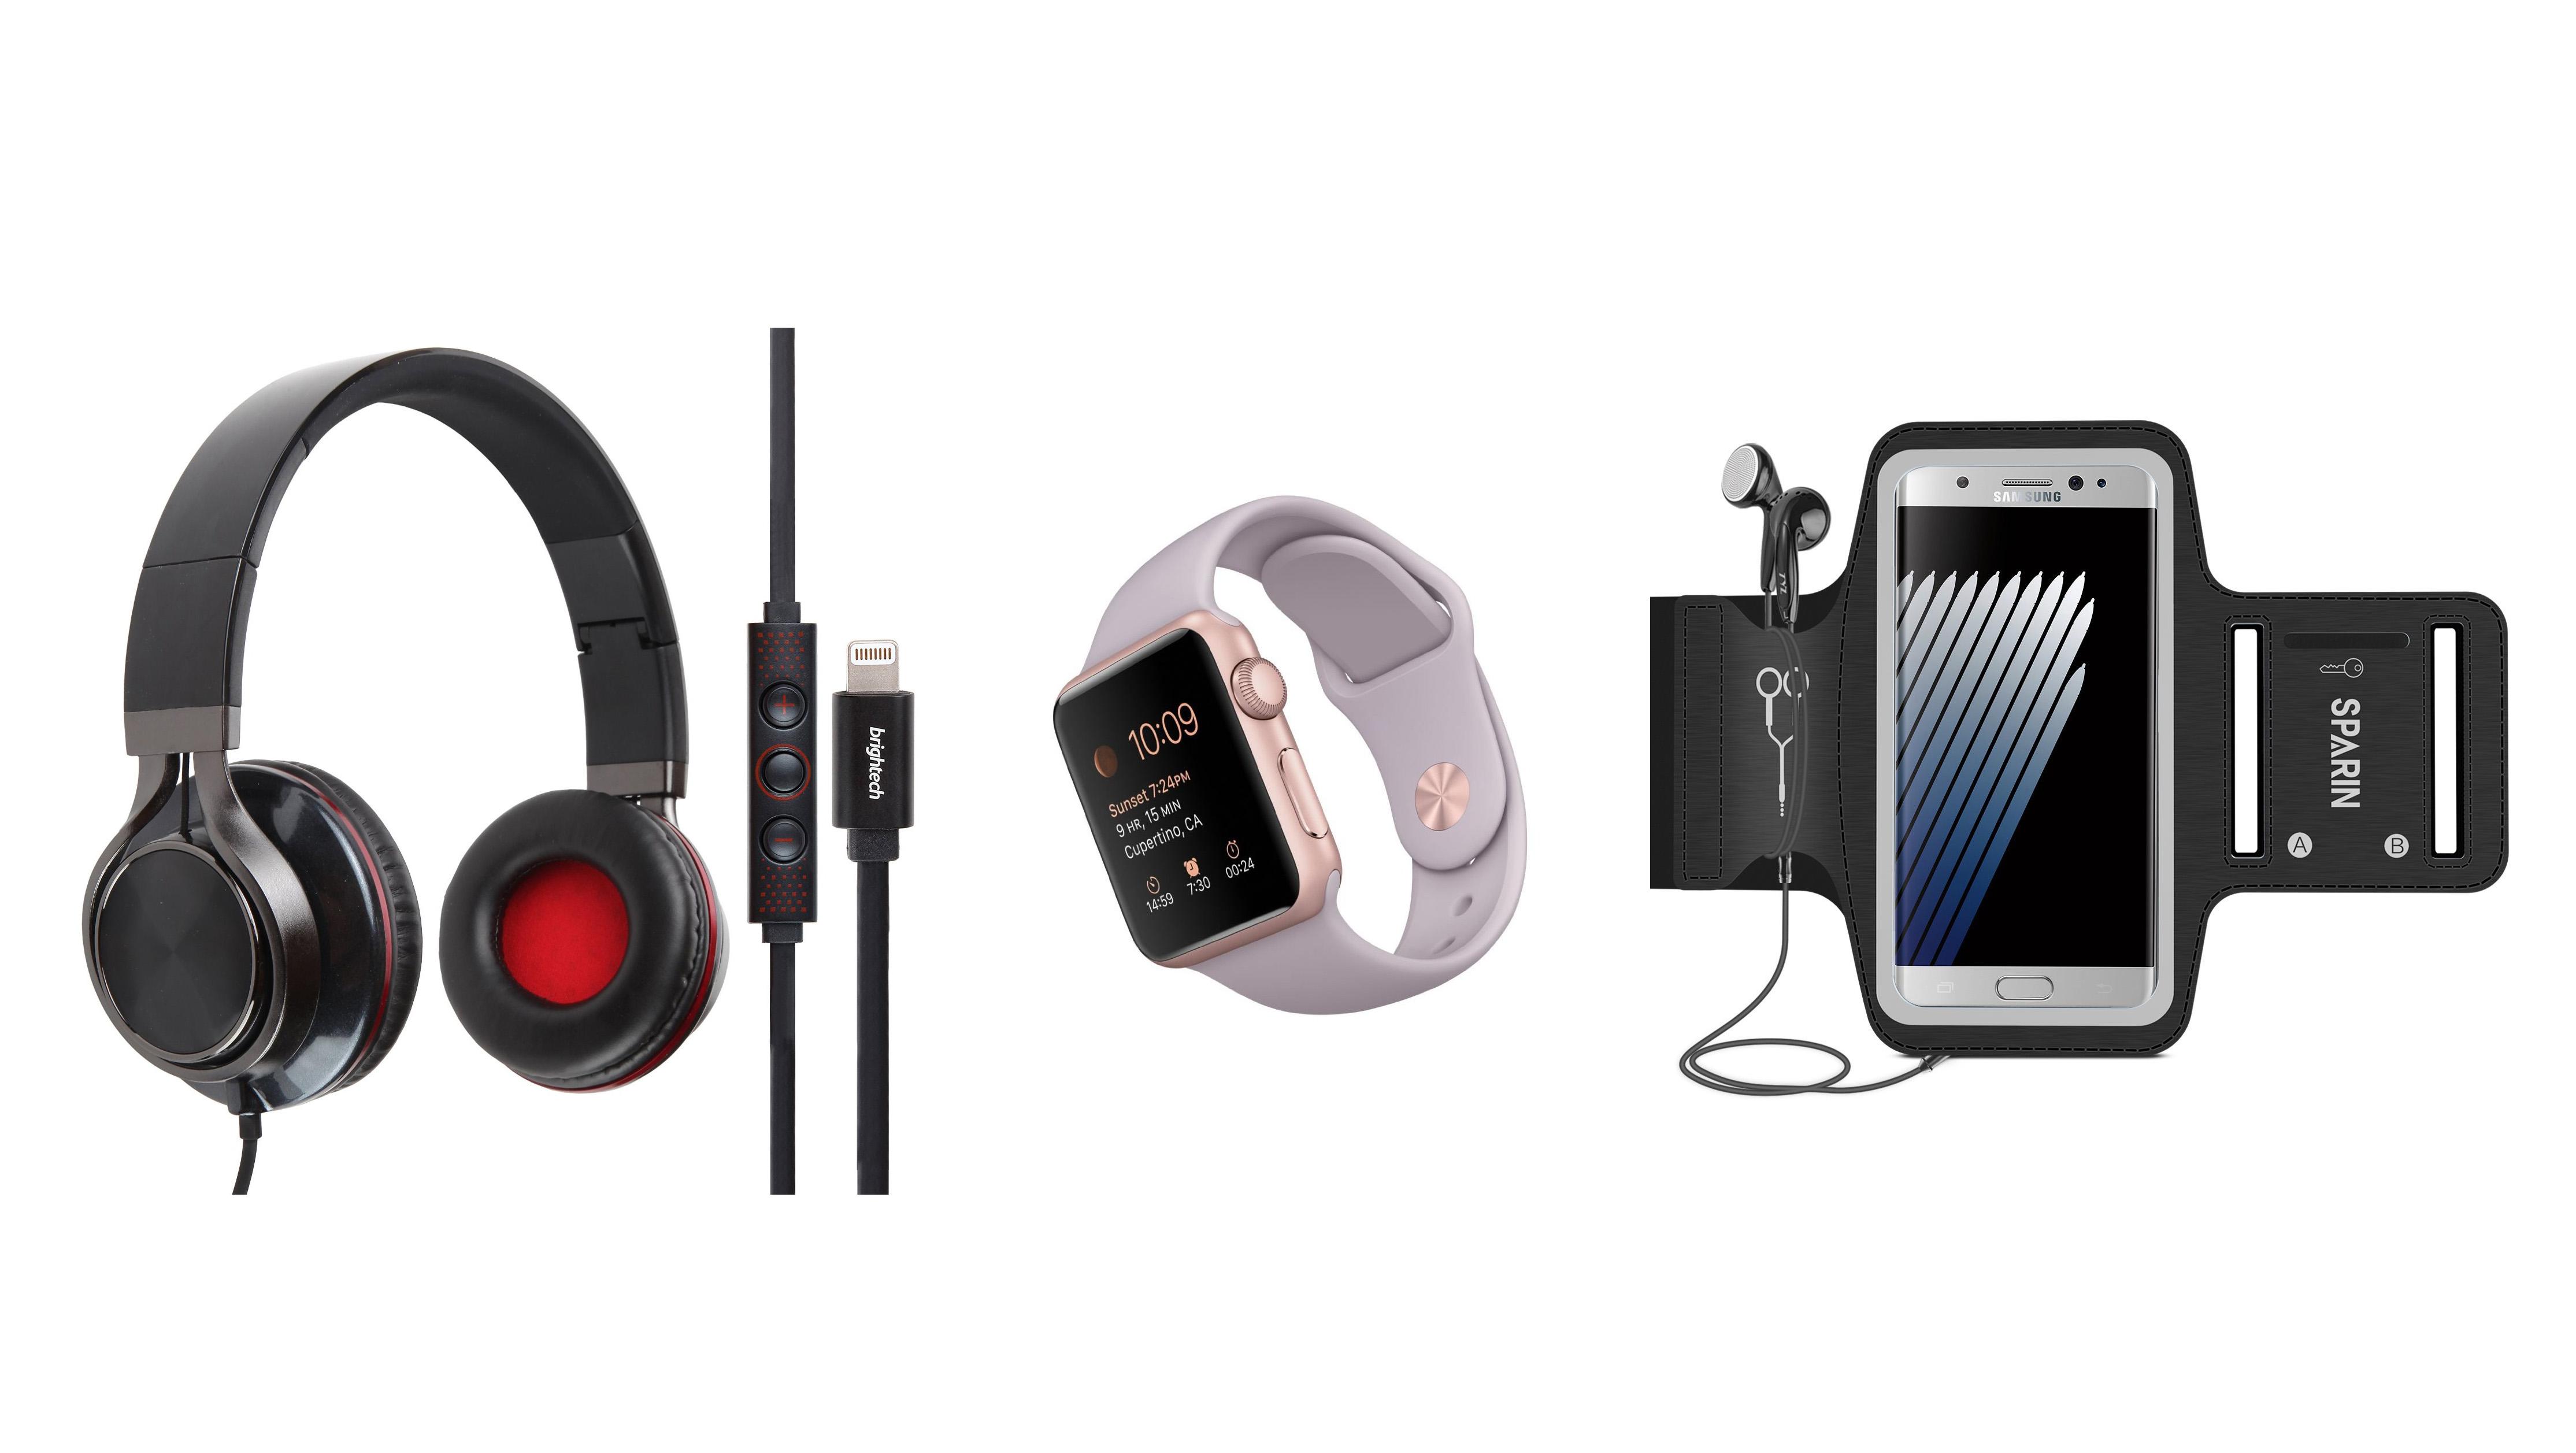 iPhone 7 Accessories, best iPhone 7 Accessories, iPhone Accessories, best iPhone Accessories, lightning headphones, iphone 7 screen protector, iOS accessories, smartphone accessories, vr headsets, iphone cases, iphone 7 cases